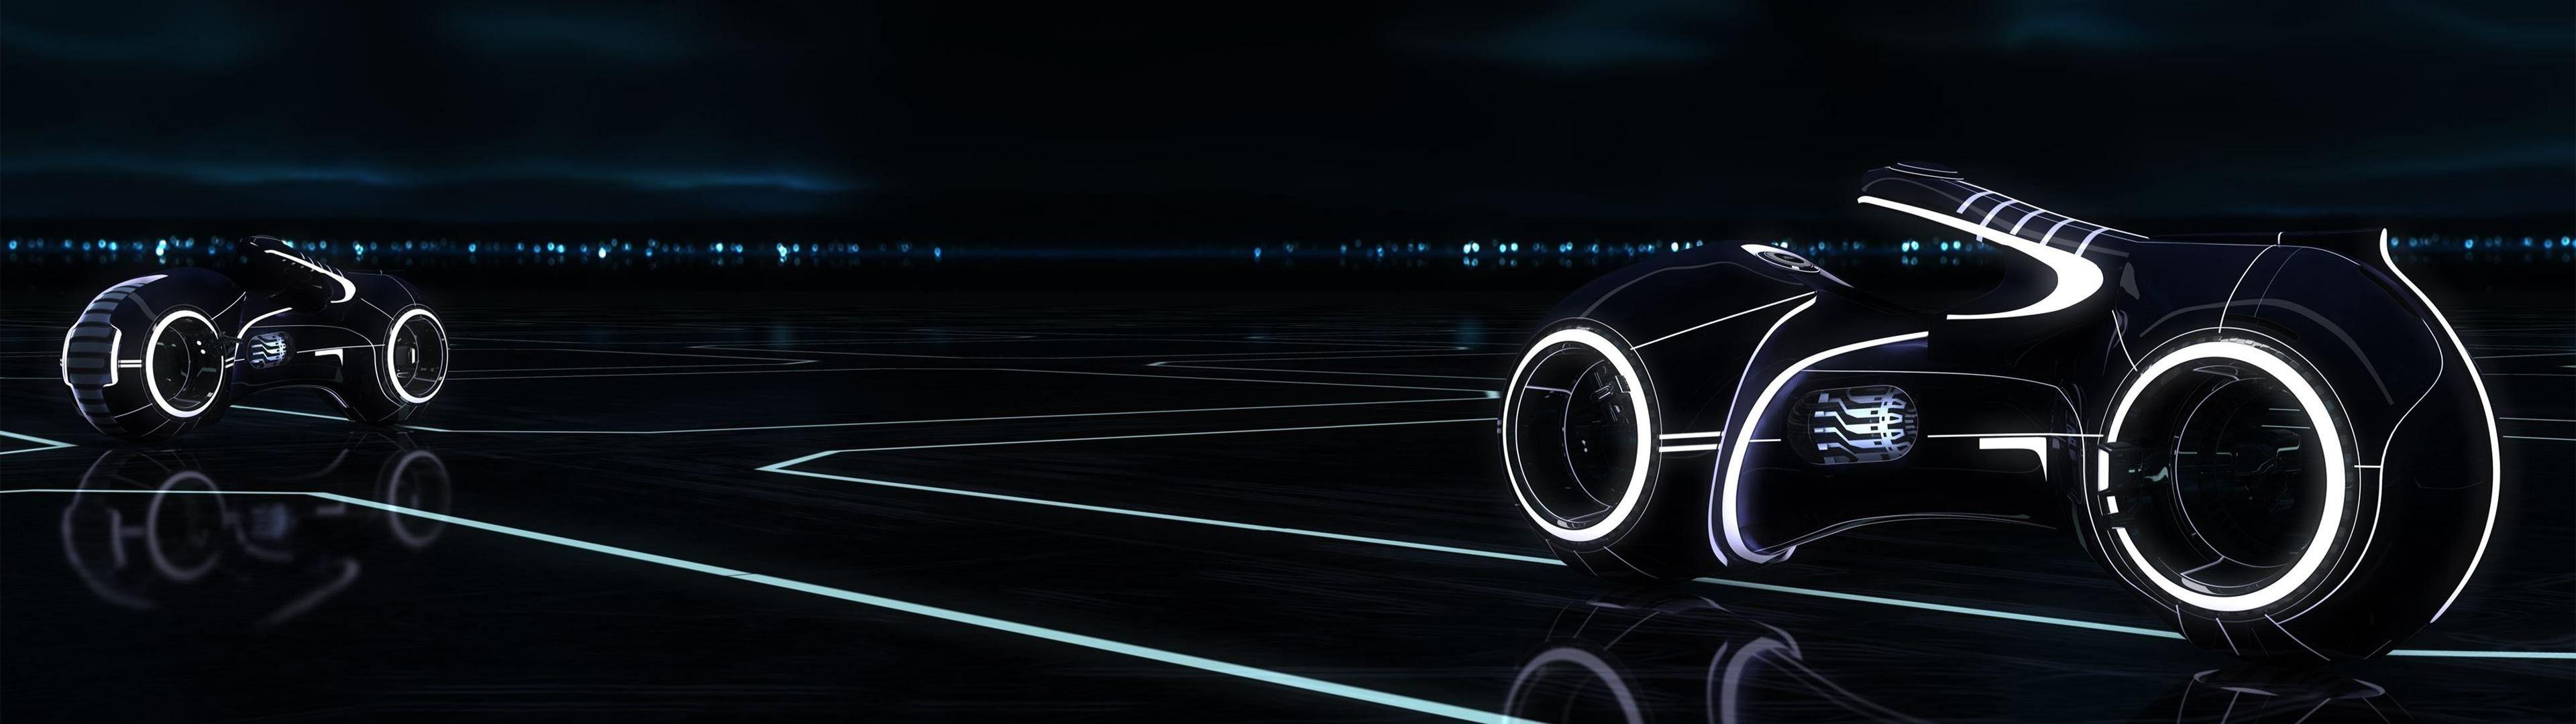 WIP Tron Legacy Lightcycle By Fuckiller On DeviantArt